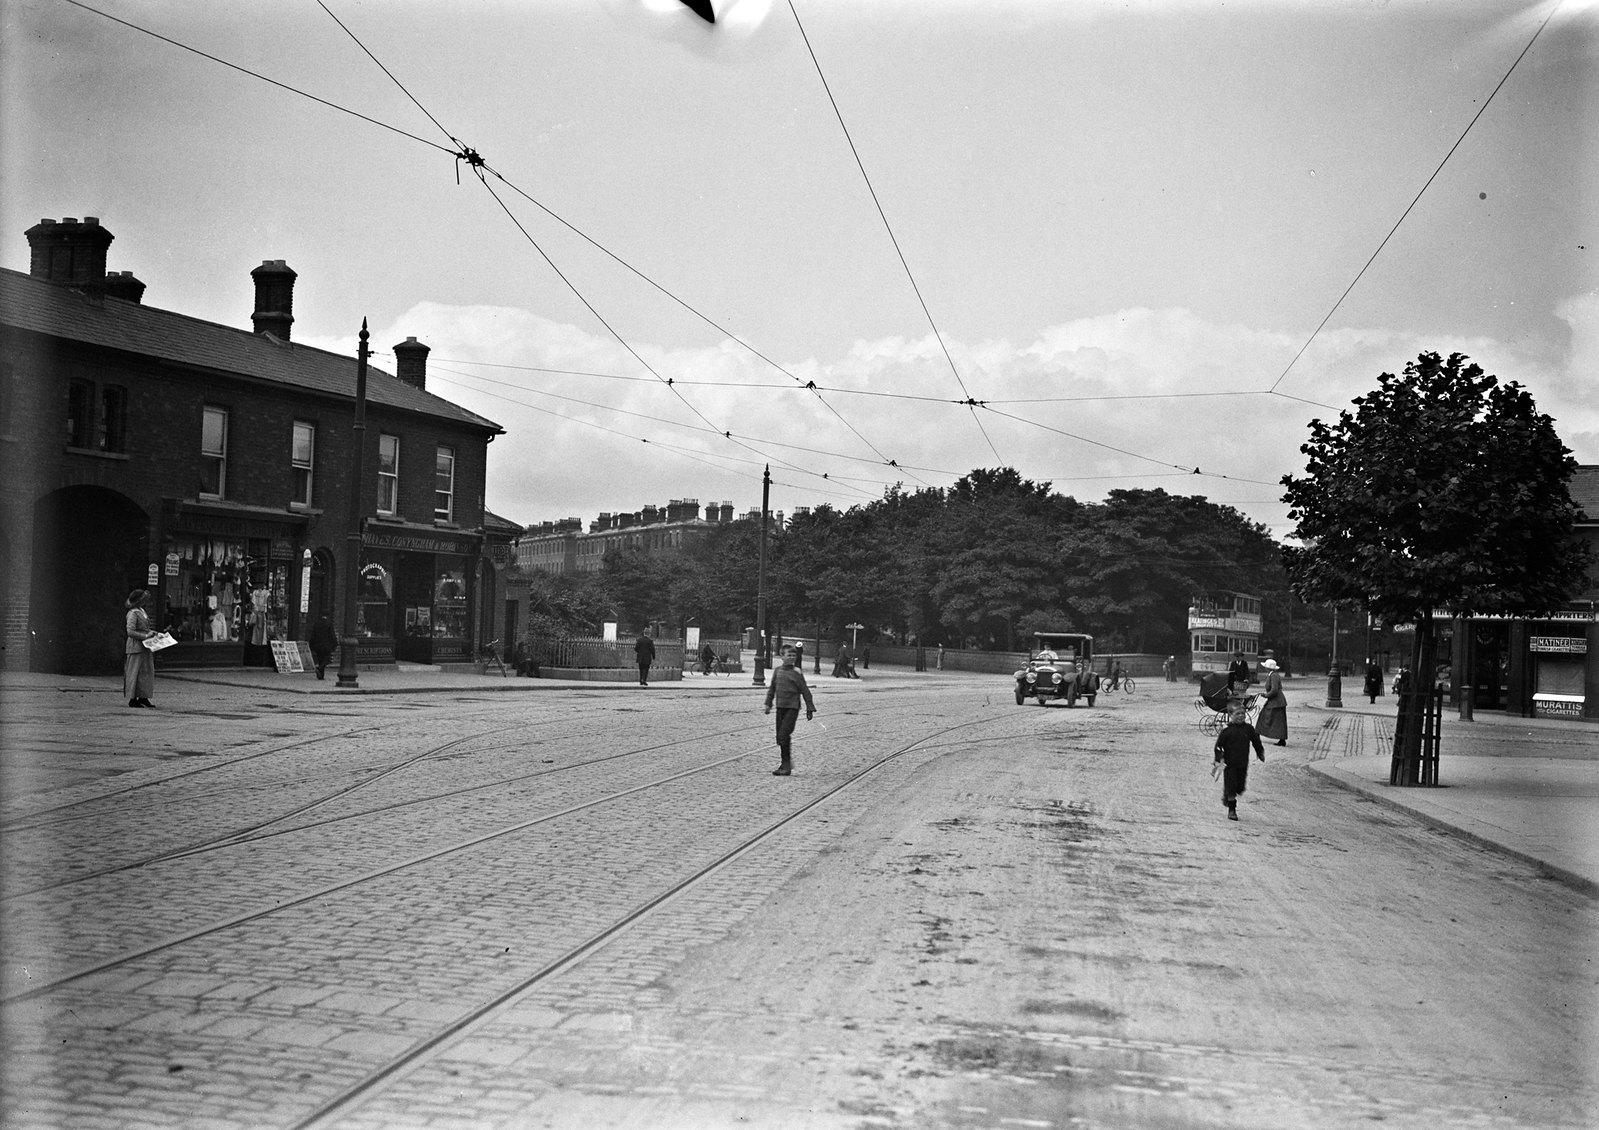 Ballsbridge, Dublin City, Co. Dublin